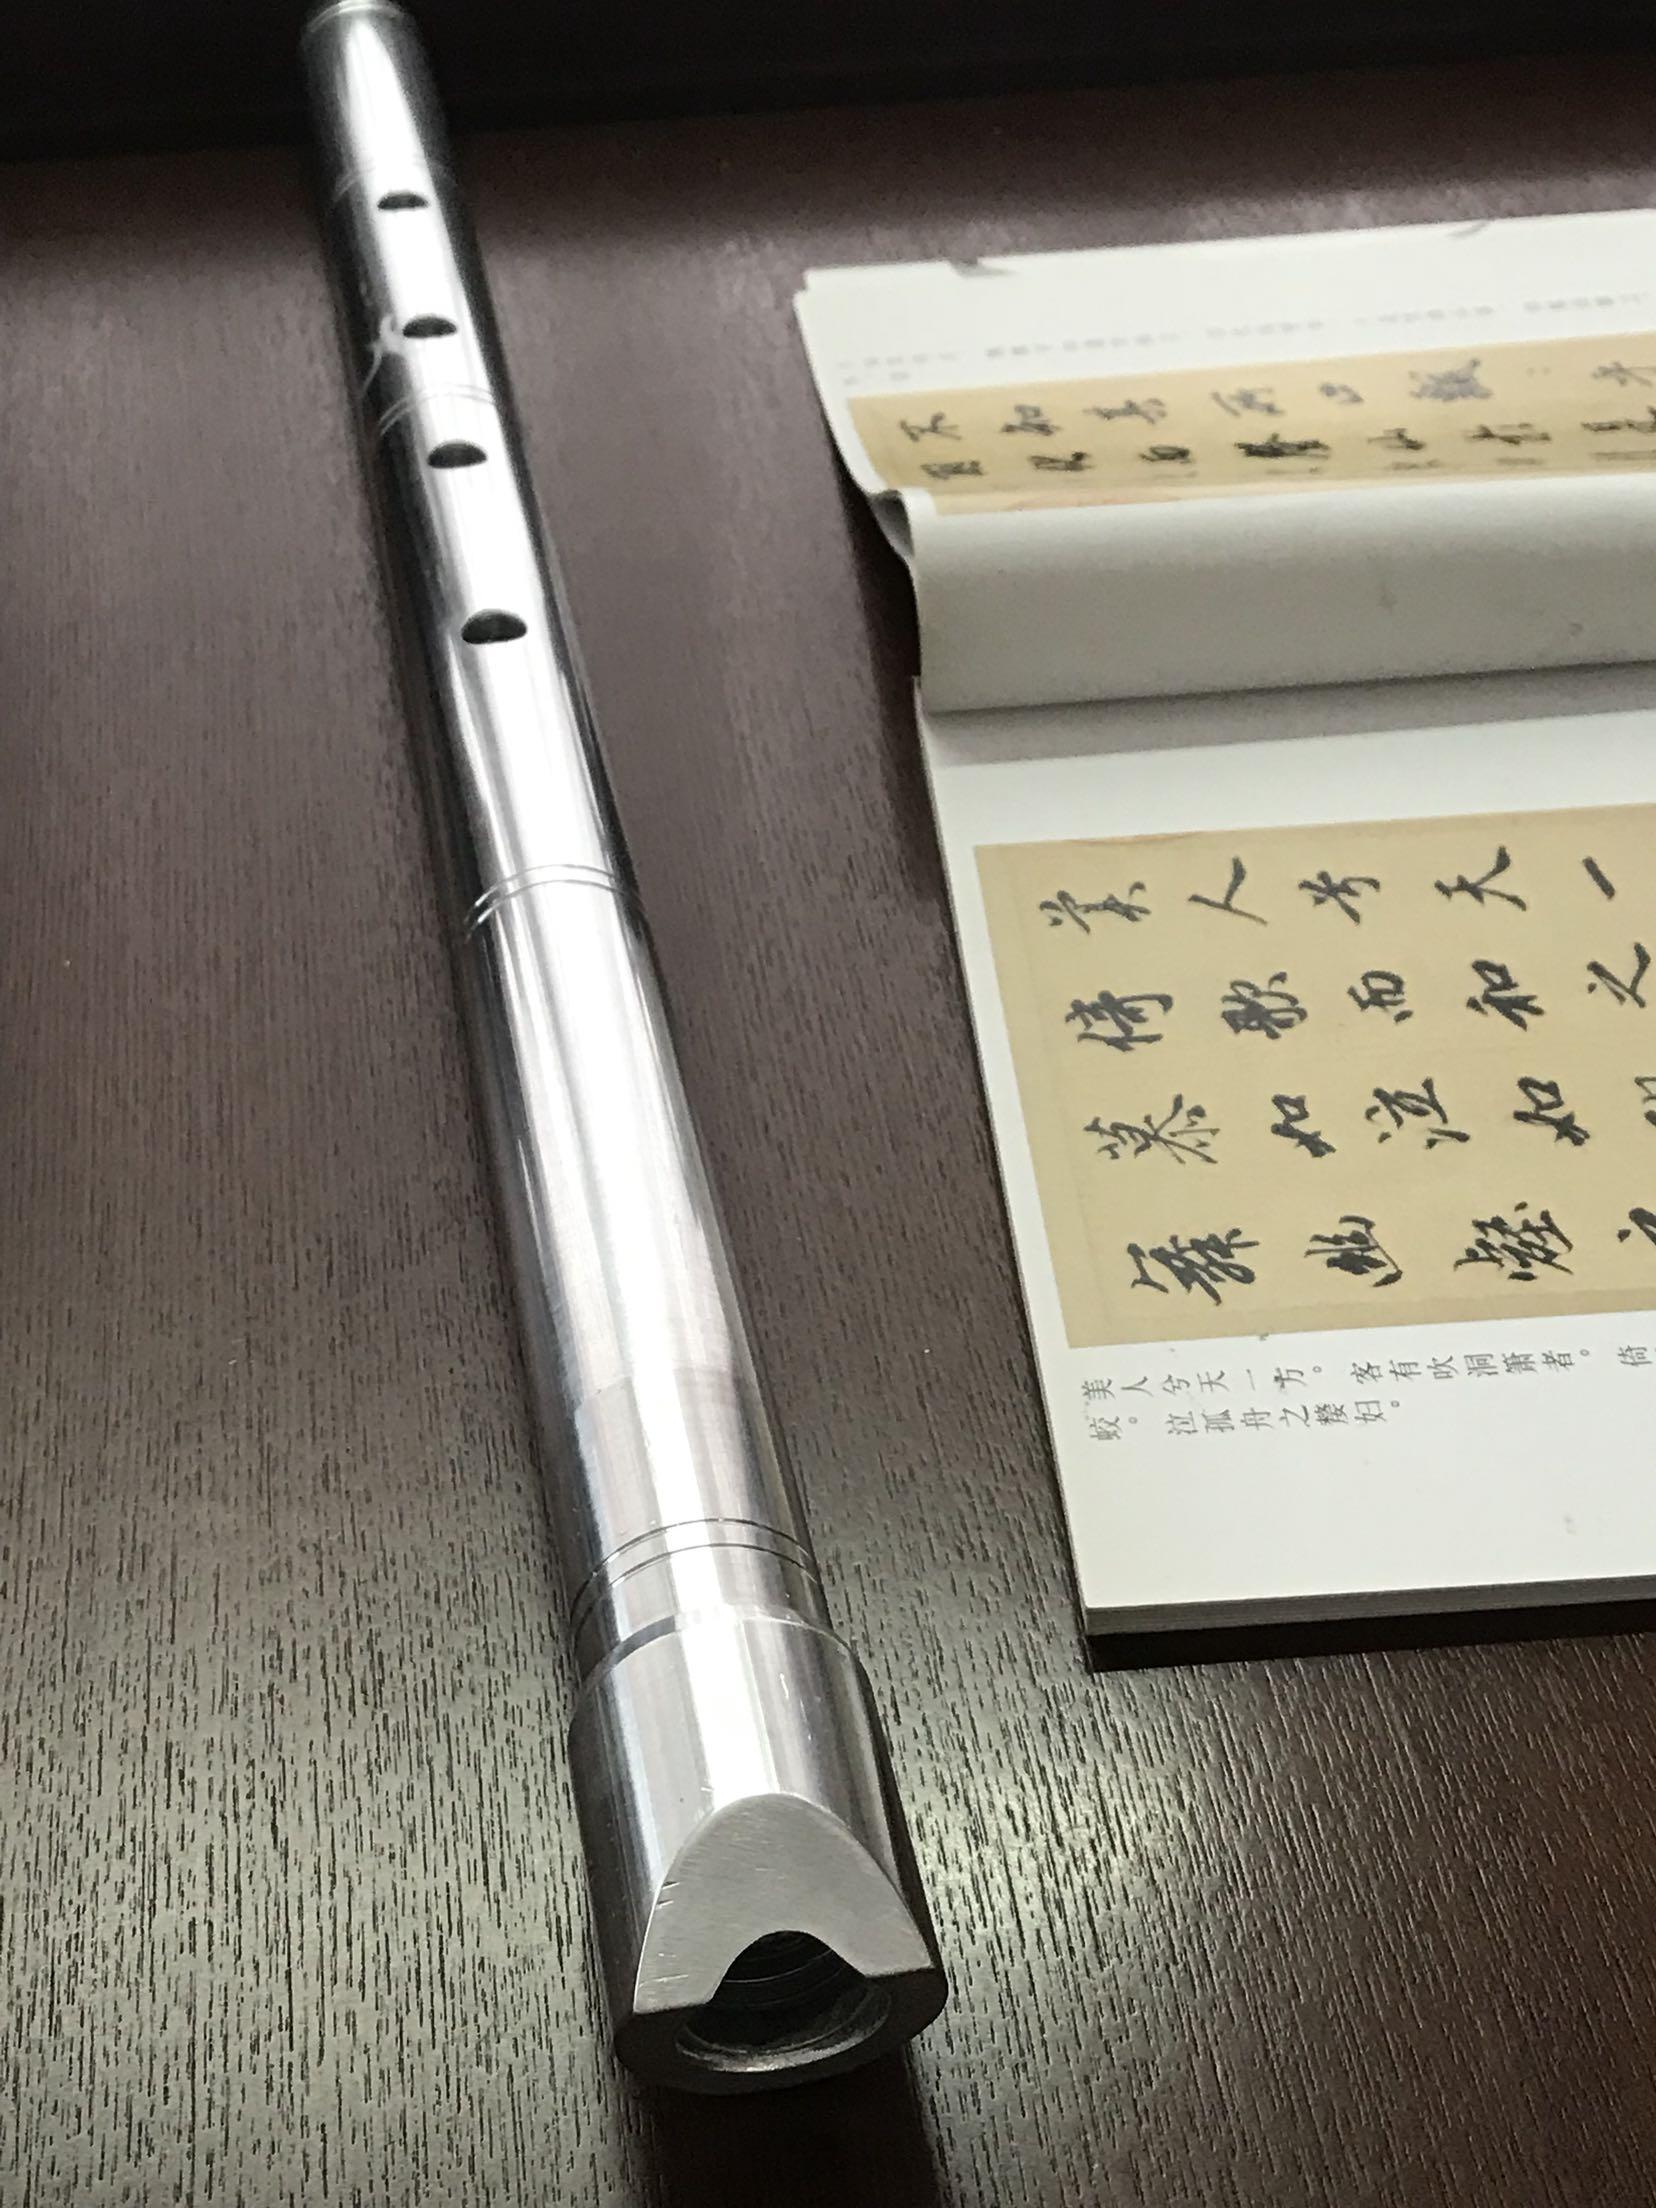 [日式五孔尺八 ] металлический [尺八 ] алюминий [合金尺八 8孔洞箫] металлический [箫唐口箫 尺八D管]